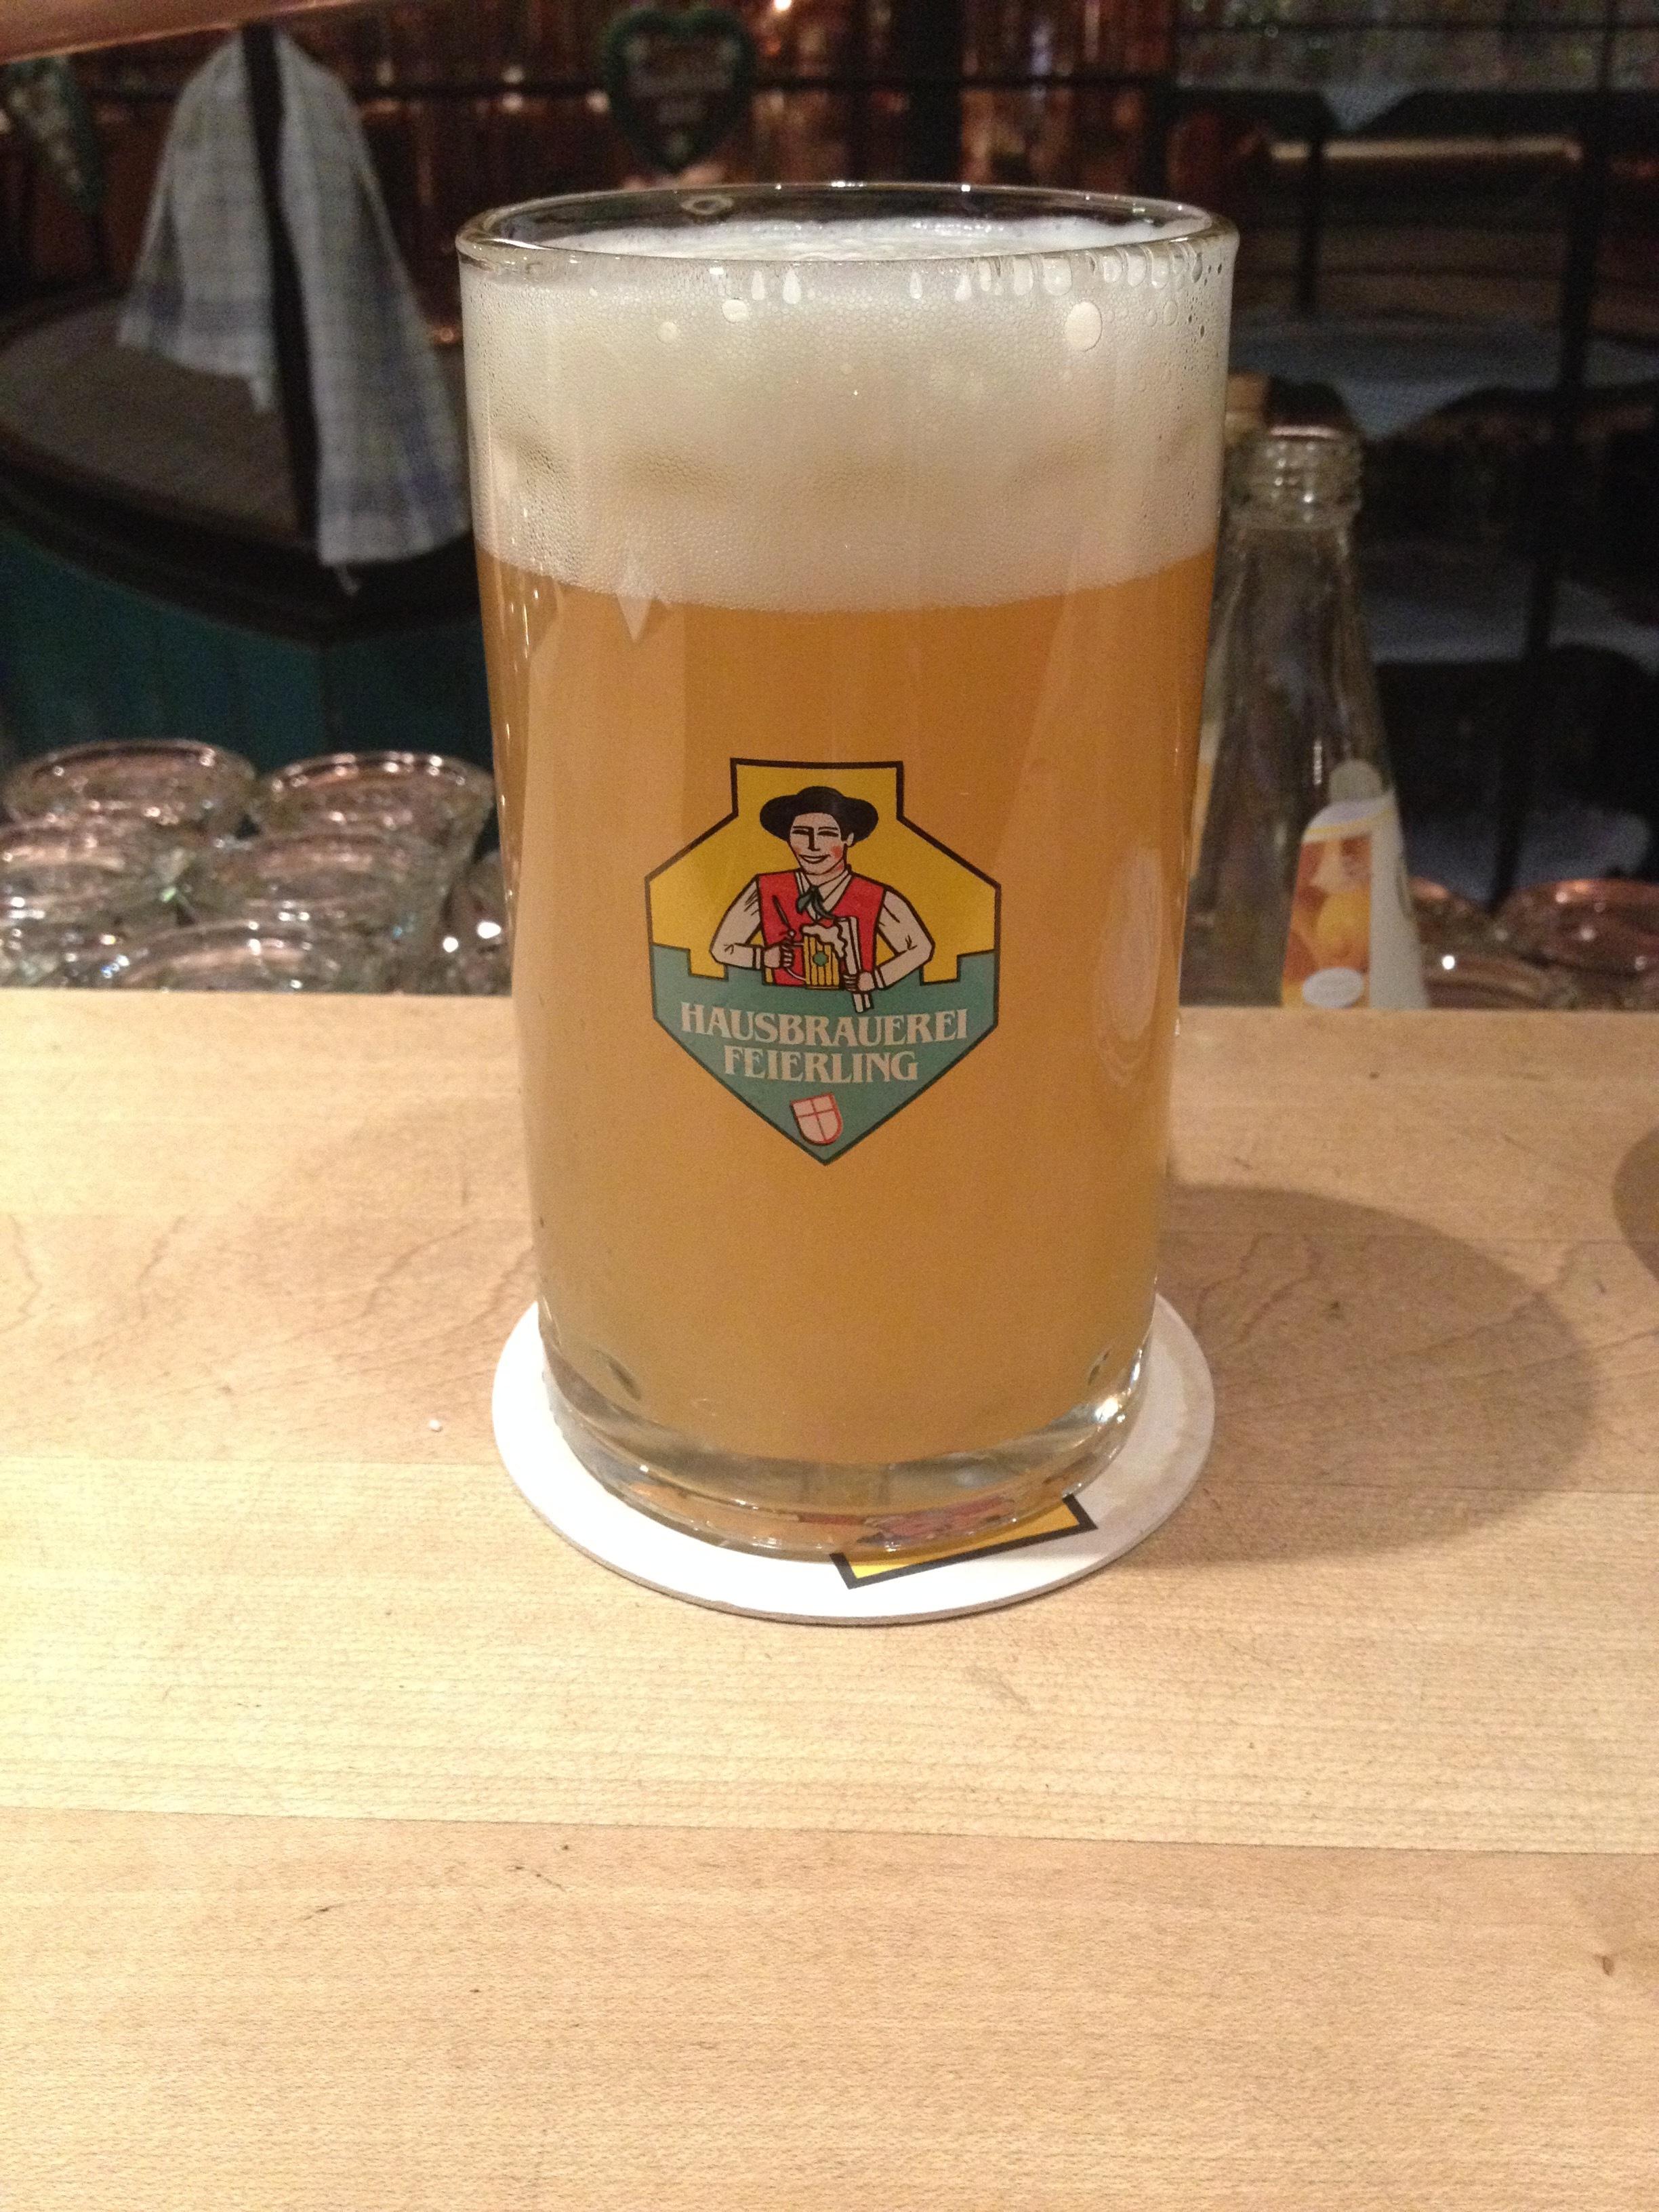 German beer: financing not needed to afford